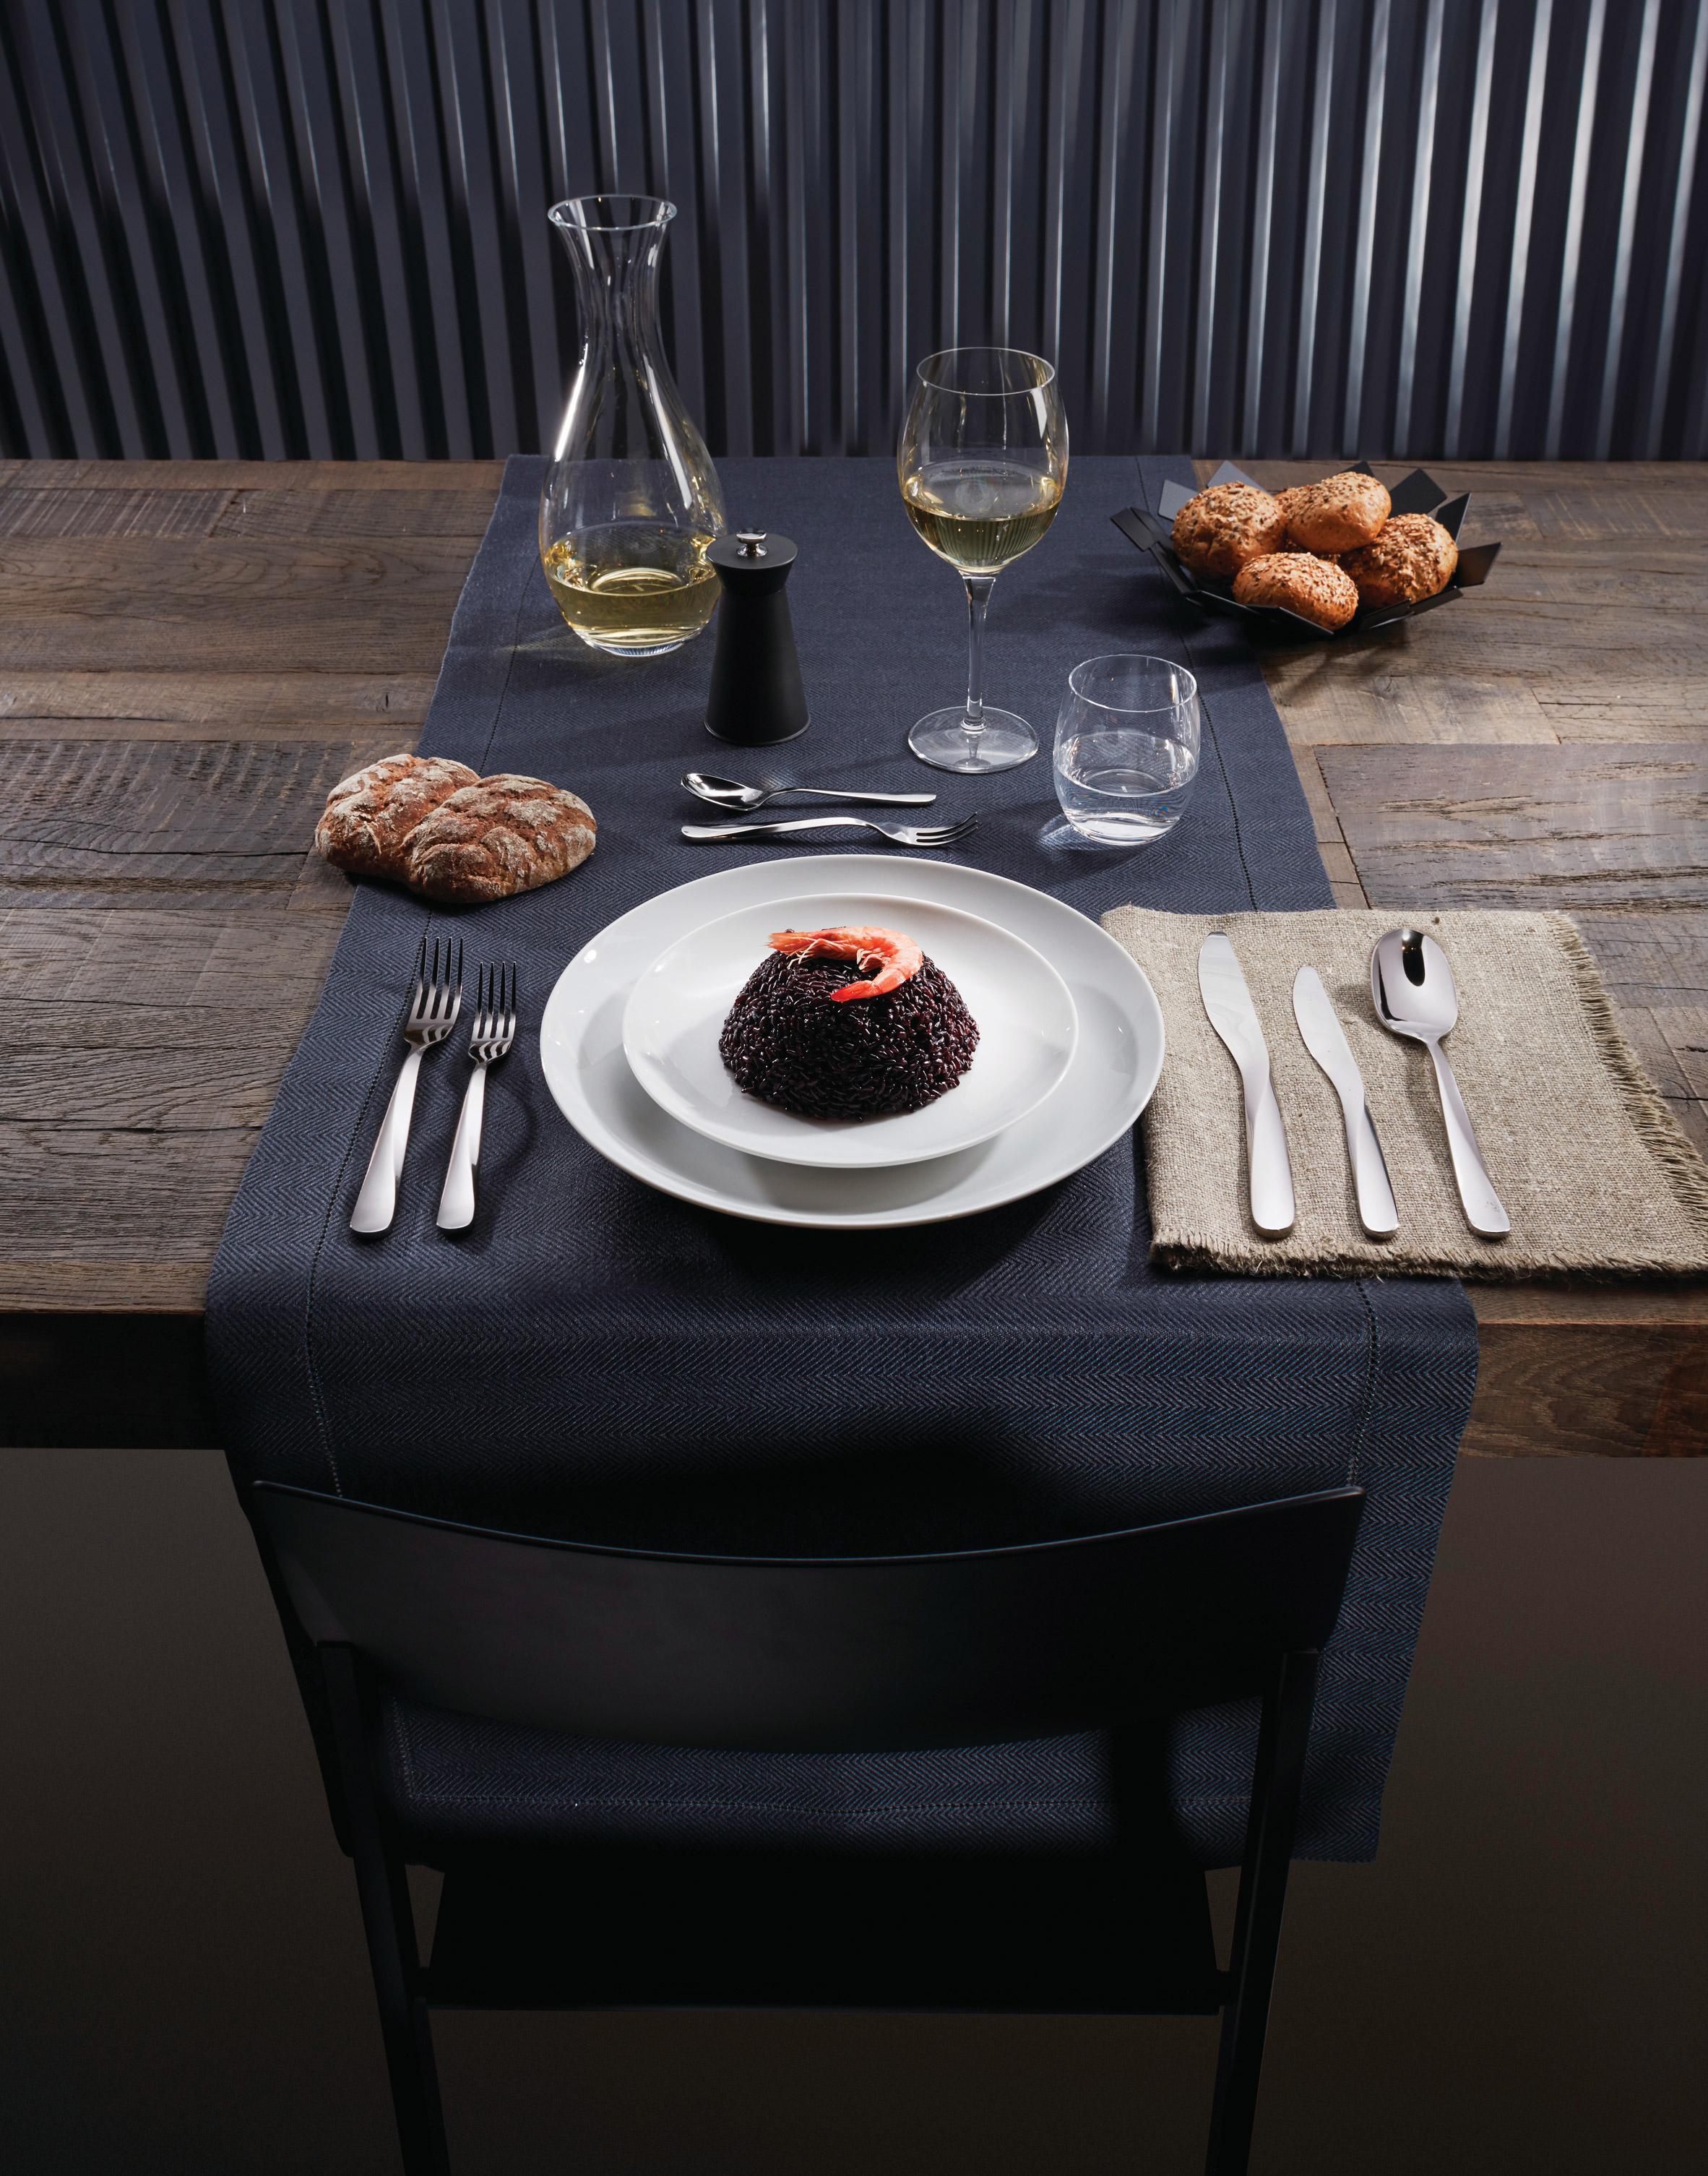 UNStudio designs twisting cutlery set for Alessi